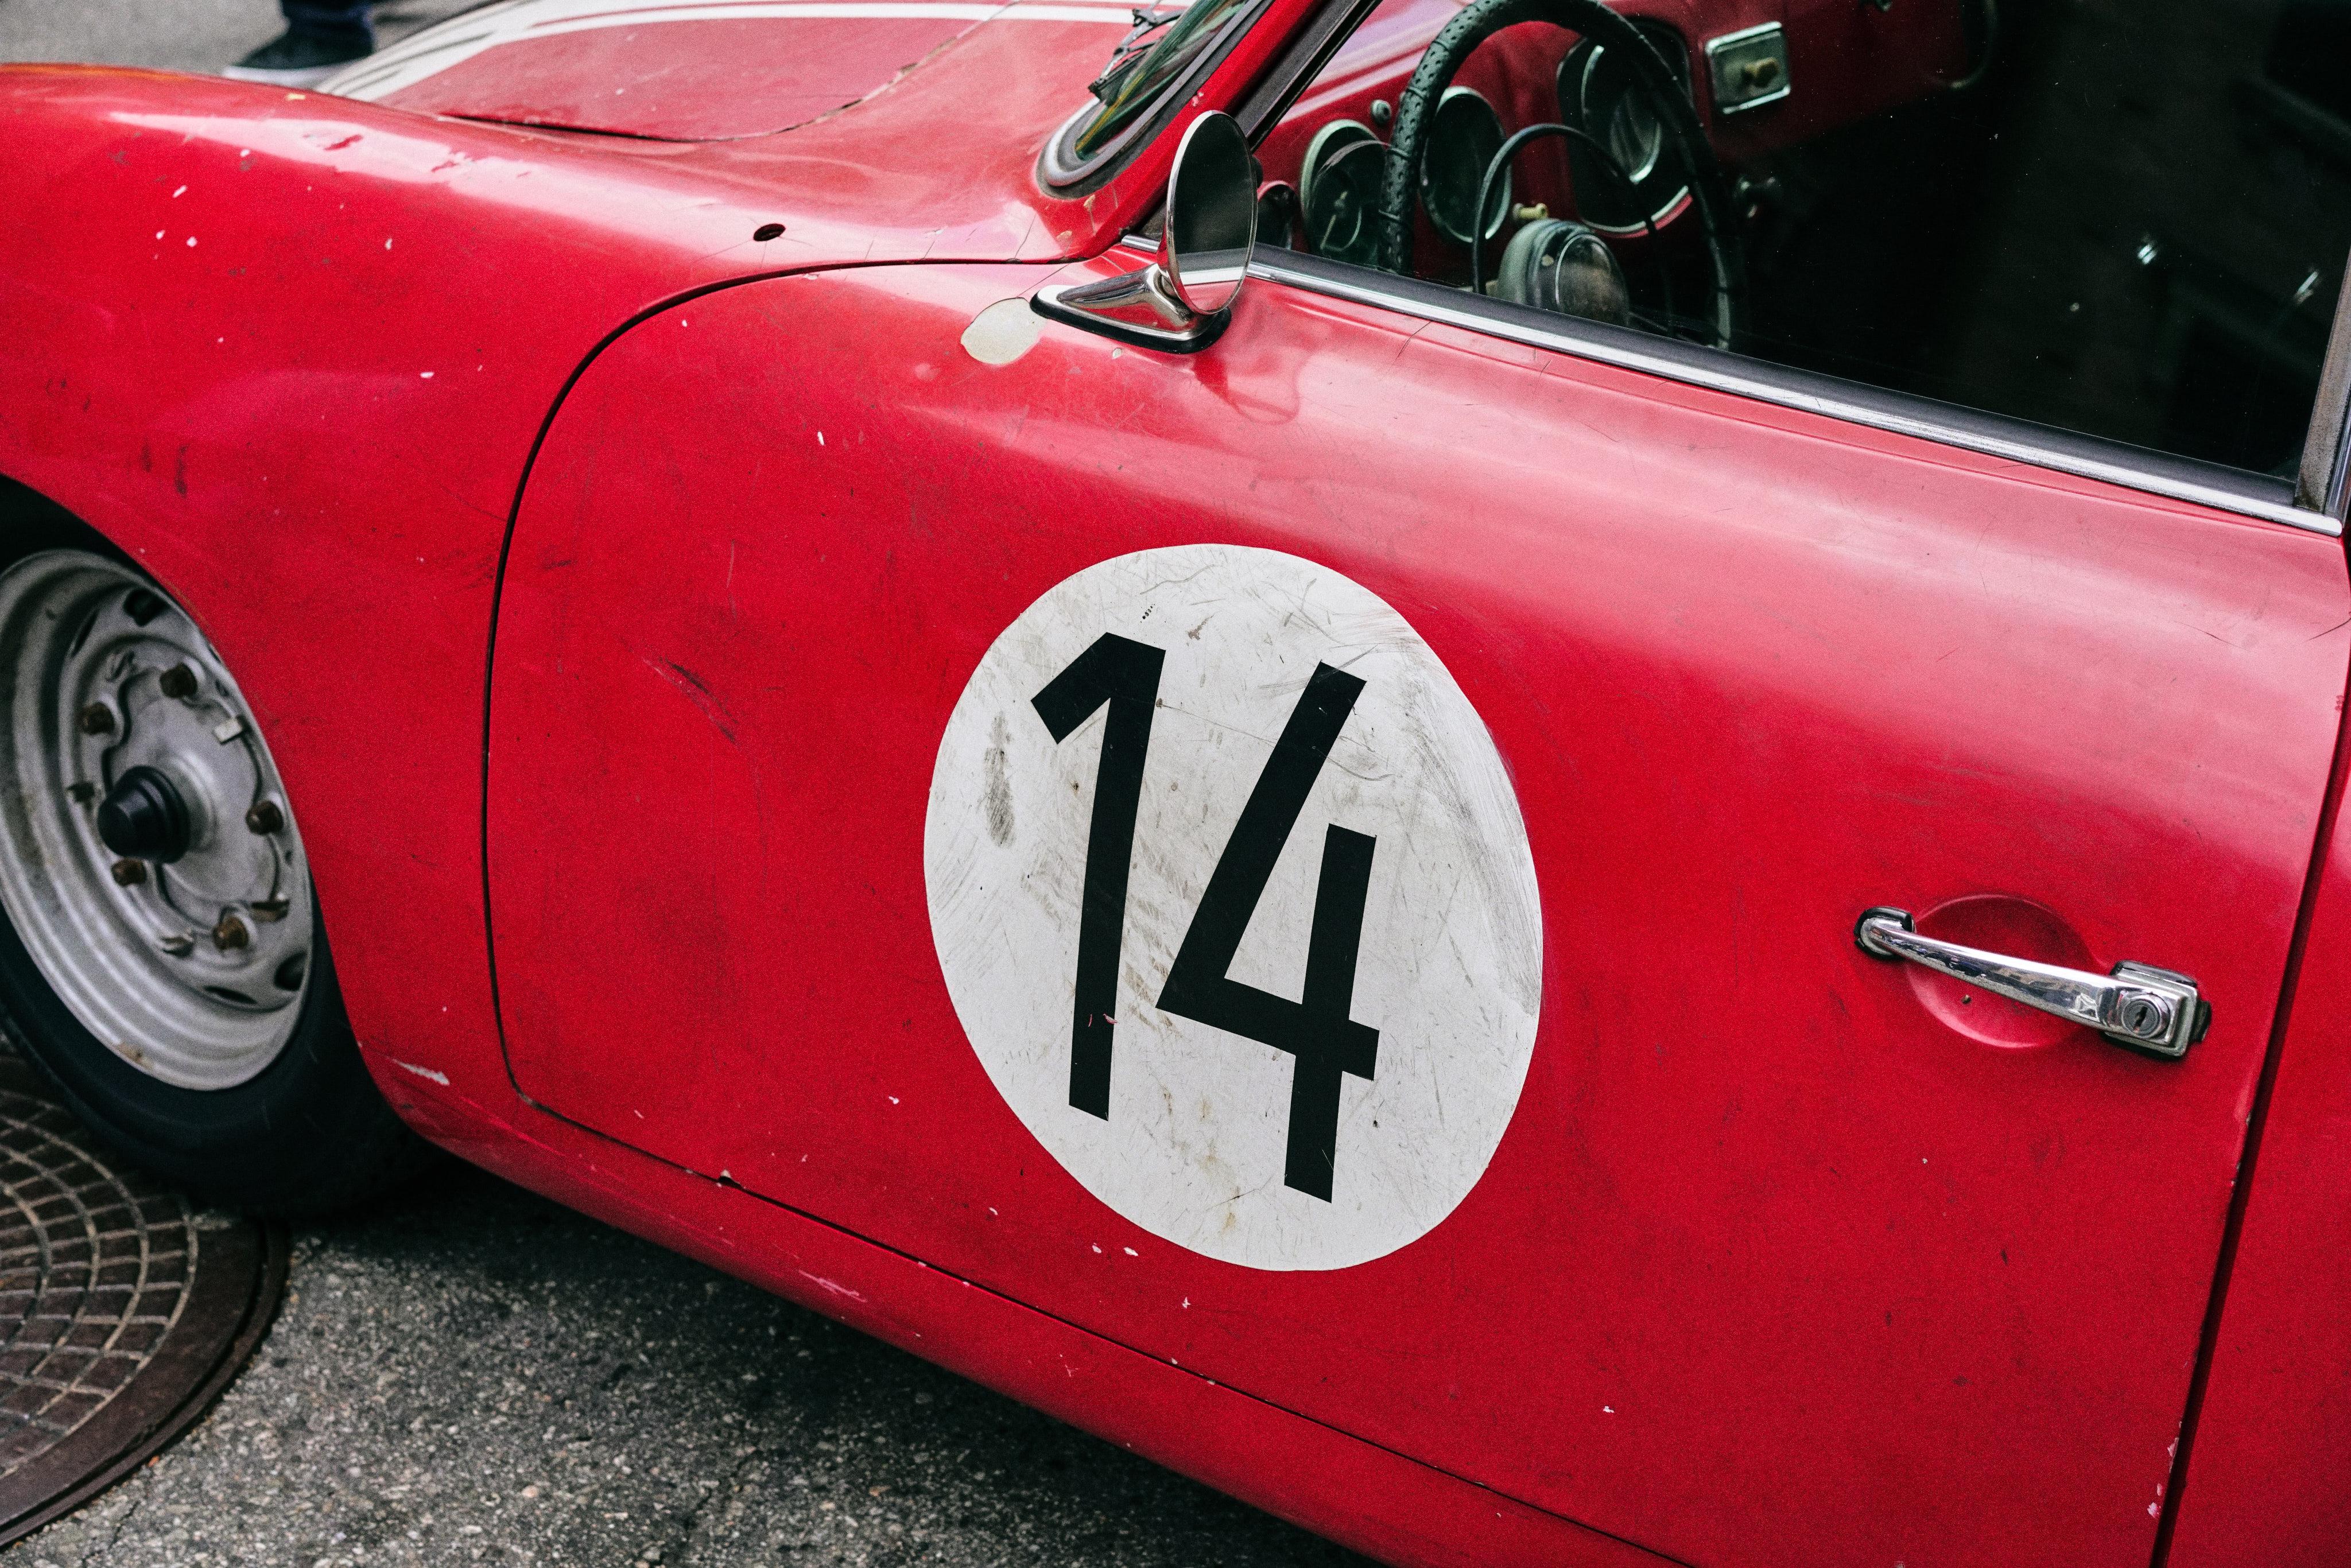 Luftgekühlt-6-Rennen-42-Porsche-356-1955-Rod-Emory-Driver